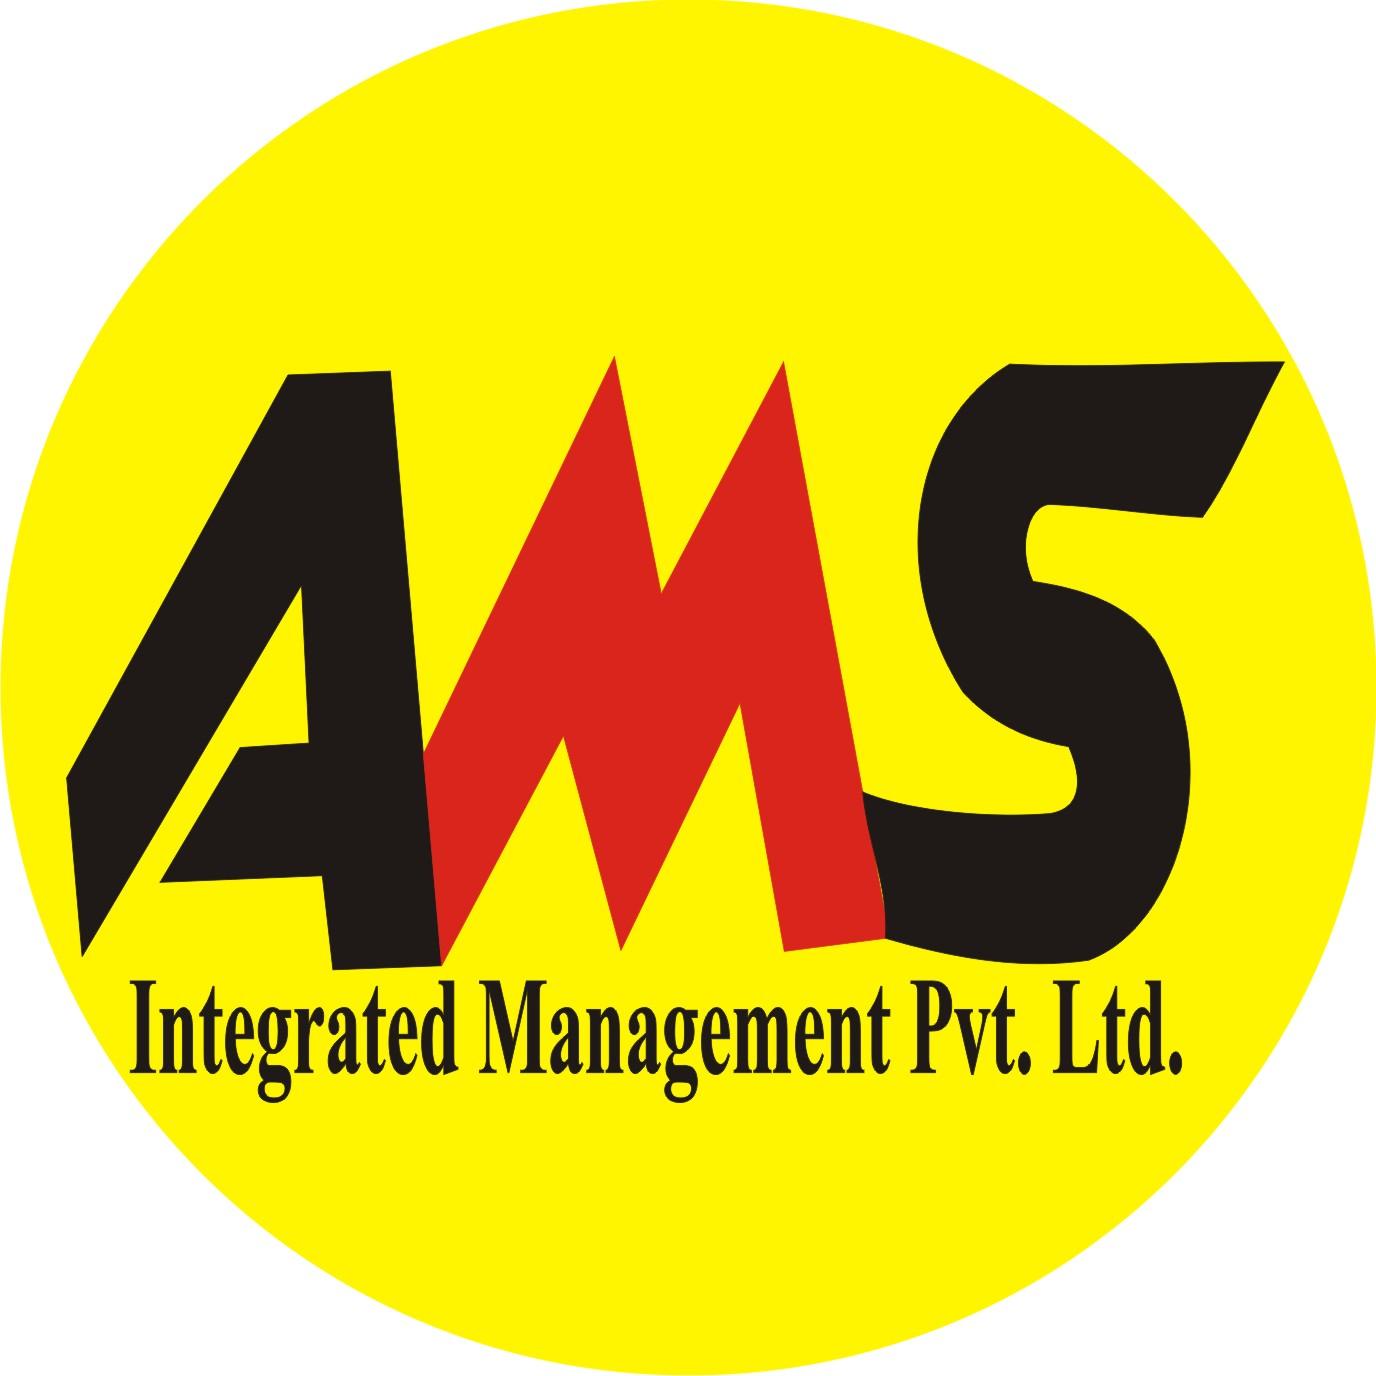 AMS Integrated Management Pvt Ltd